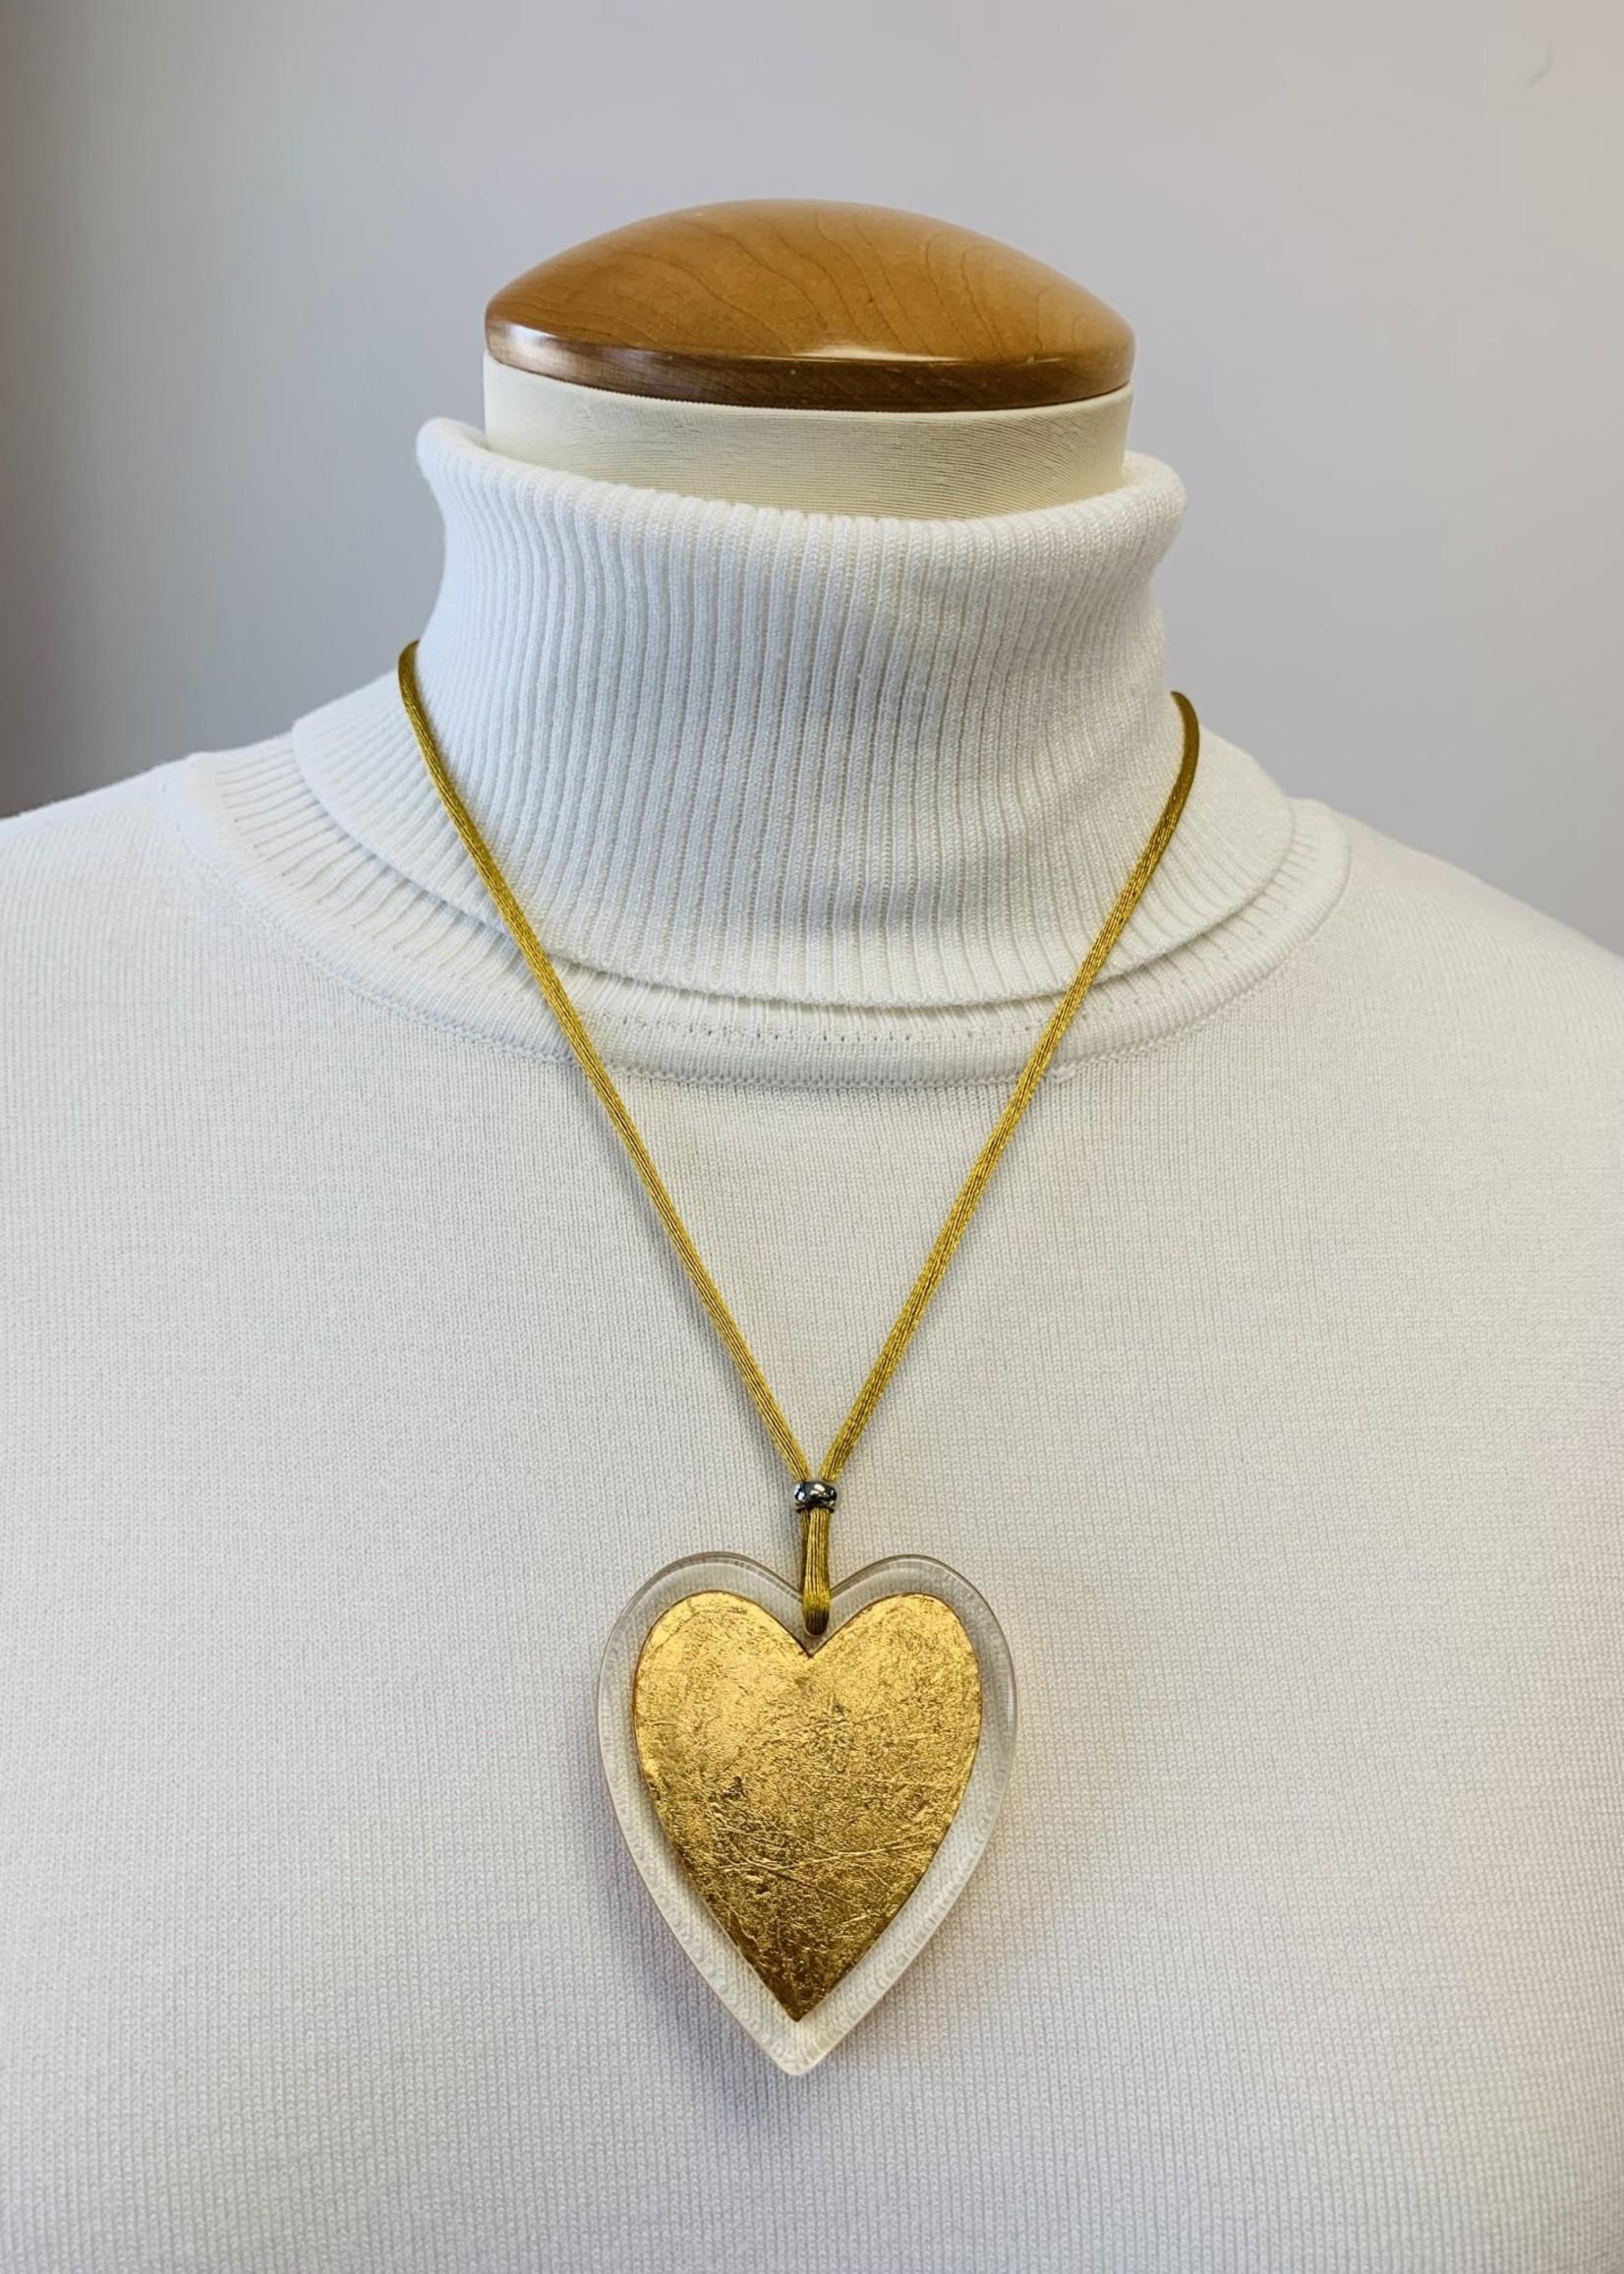 Zsiska Zsiska Small Heart  Pendant Gold Leaf